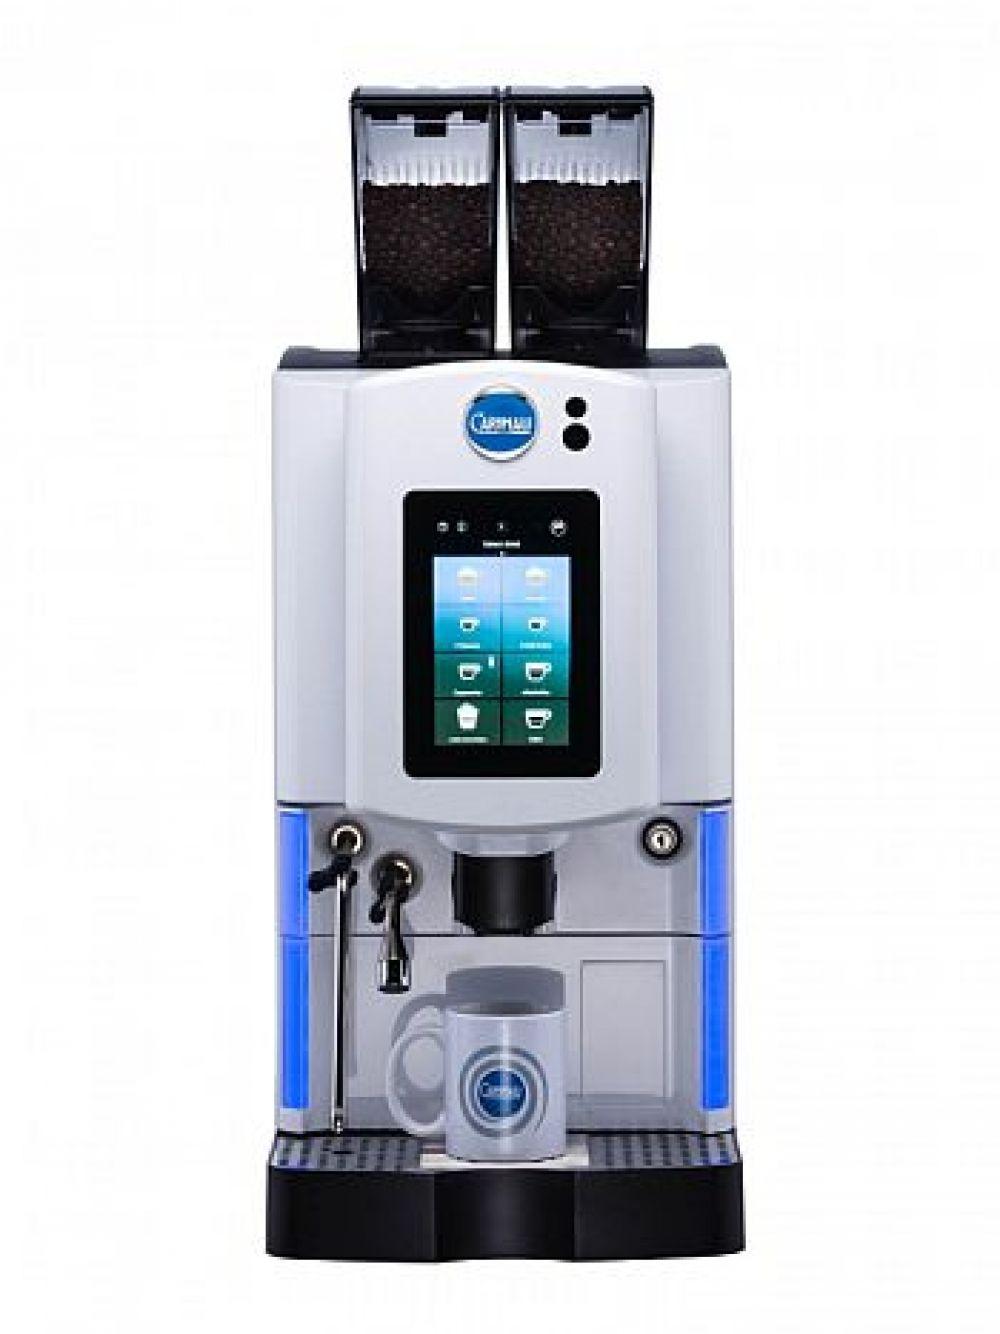 Carimali optima soft plus automatic coffee machine